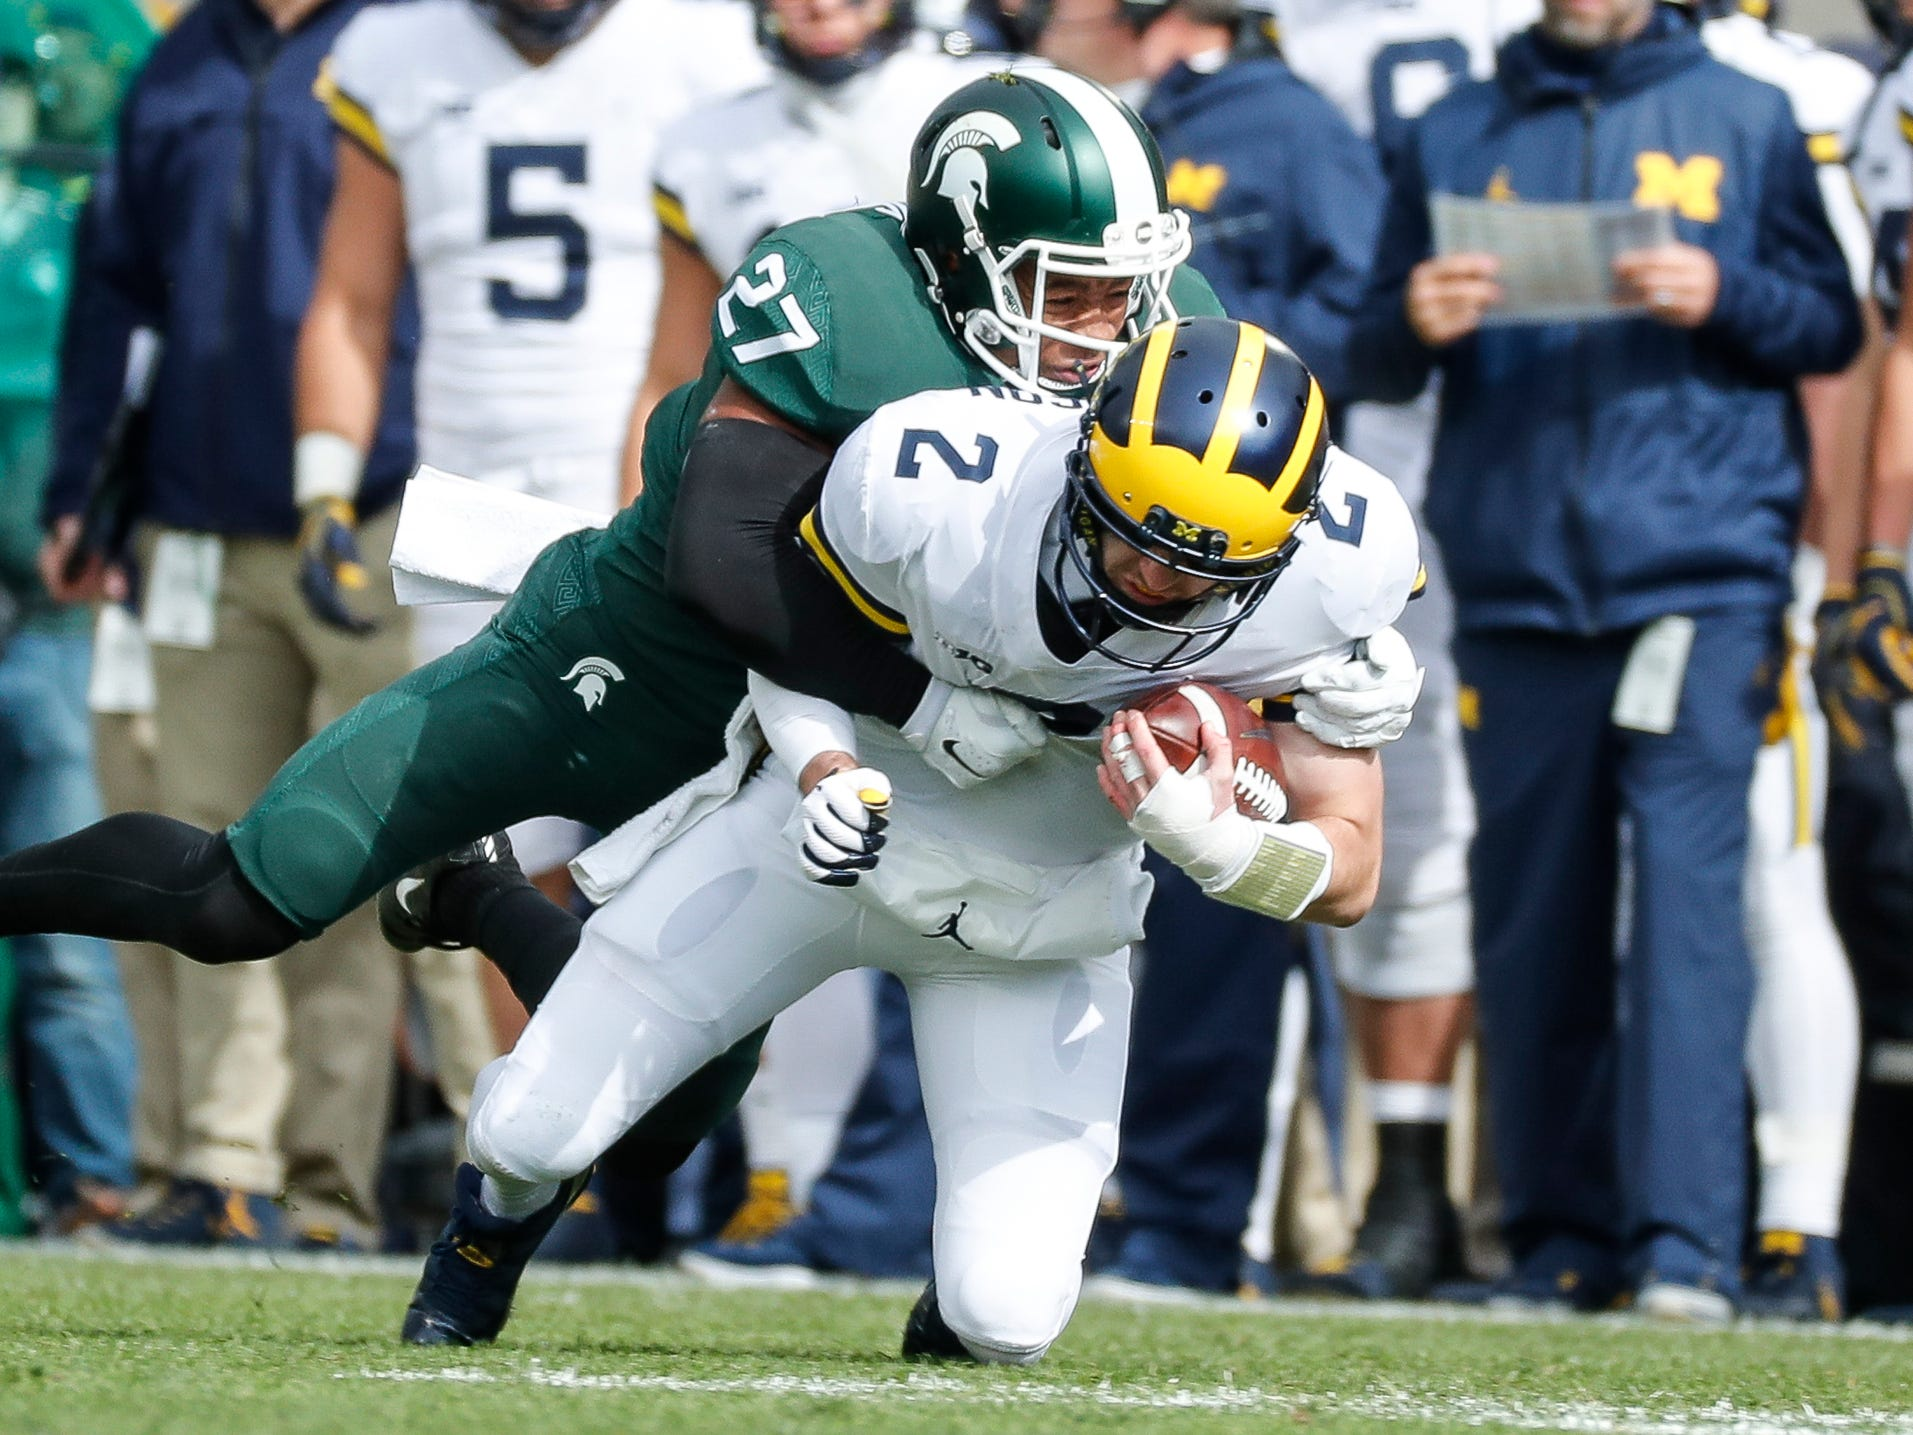 Michigan State safety Khari Willis tackles Michigan quarterback Shea Patterson during the first half at Spartan Stadium on Saturday, Oct. 20, 2018.